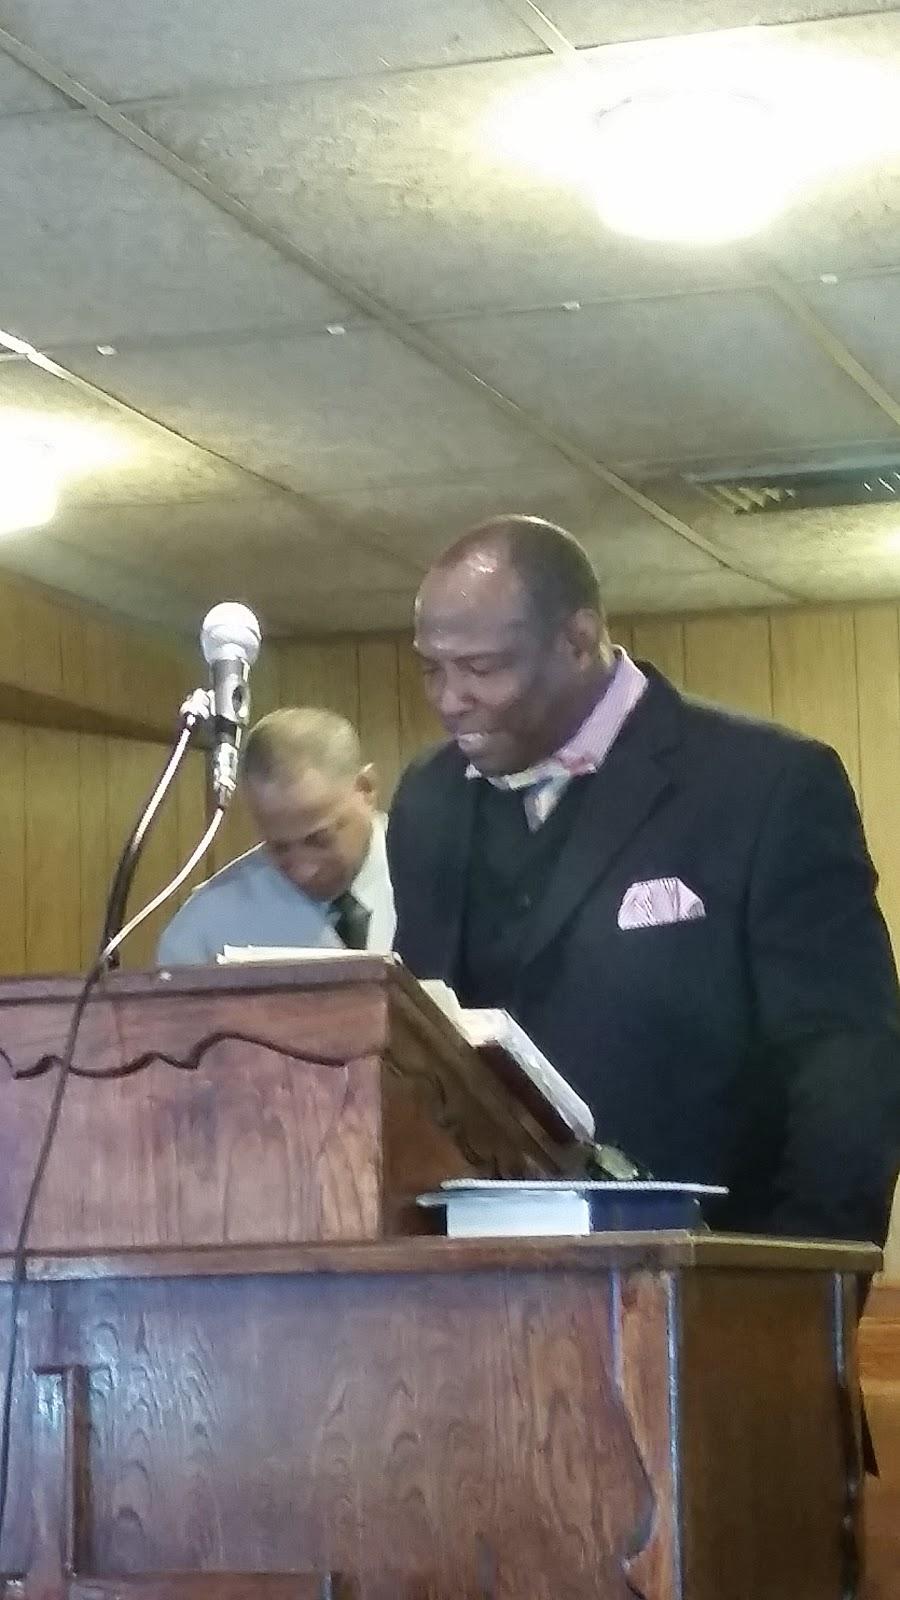 Nehemiah Bible Based Church - church  | Photo 1 of 8 | Address: 800 Burkburnett Rd, Wichita Falls, TX 76306, USA | Phone: (940) 237-2010